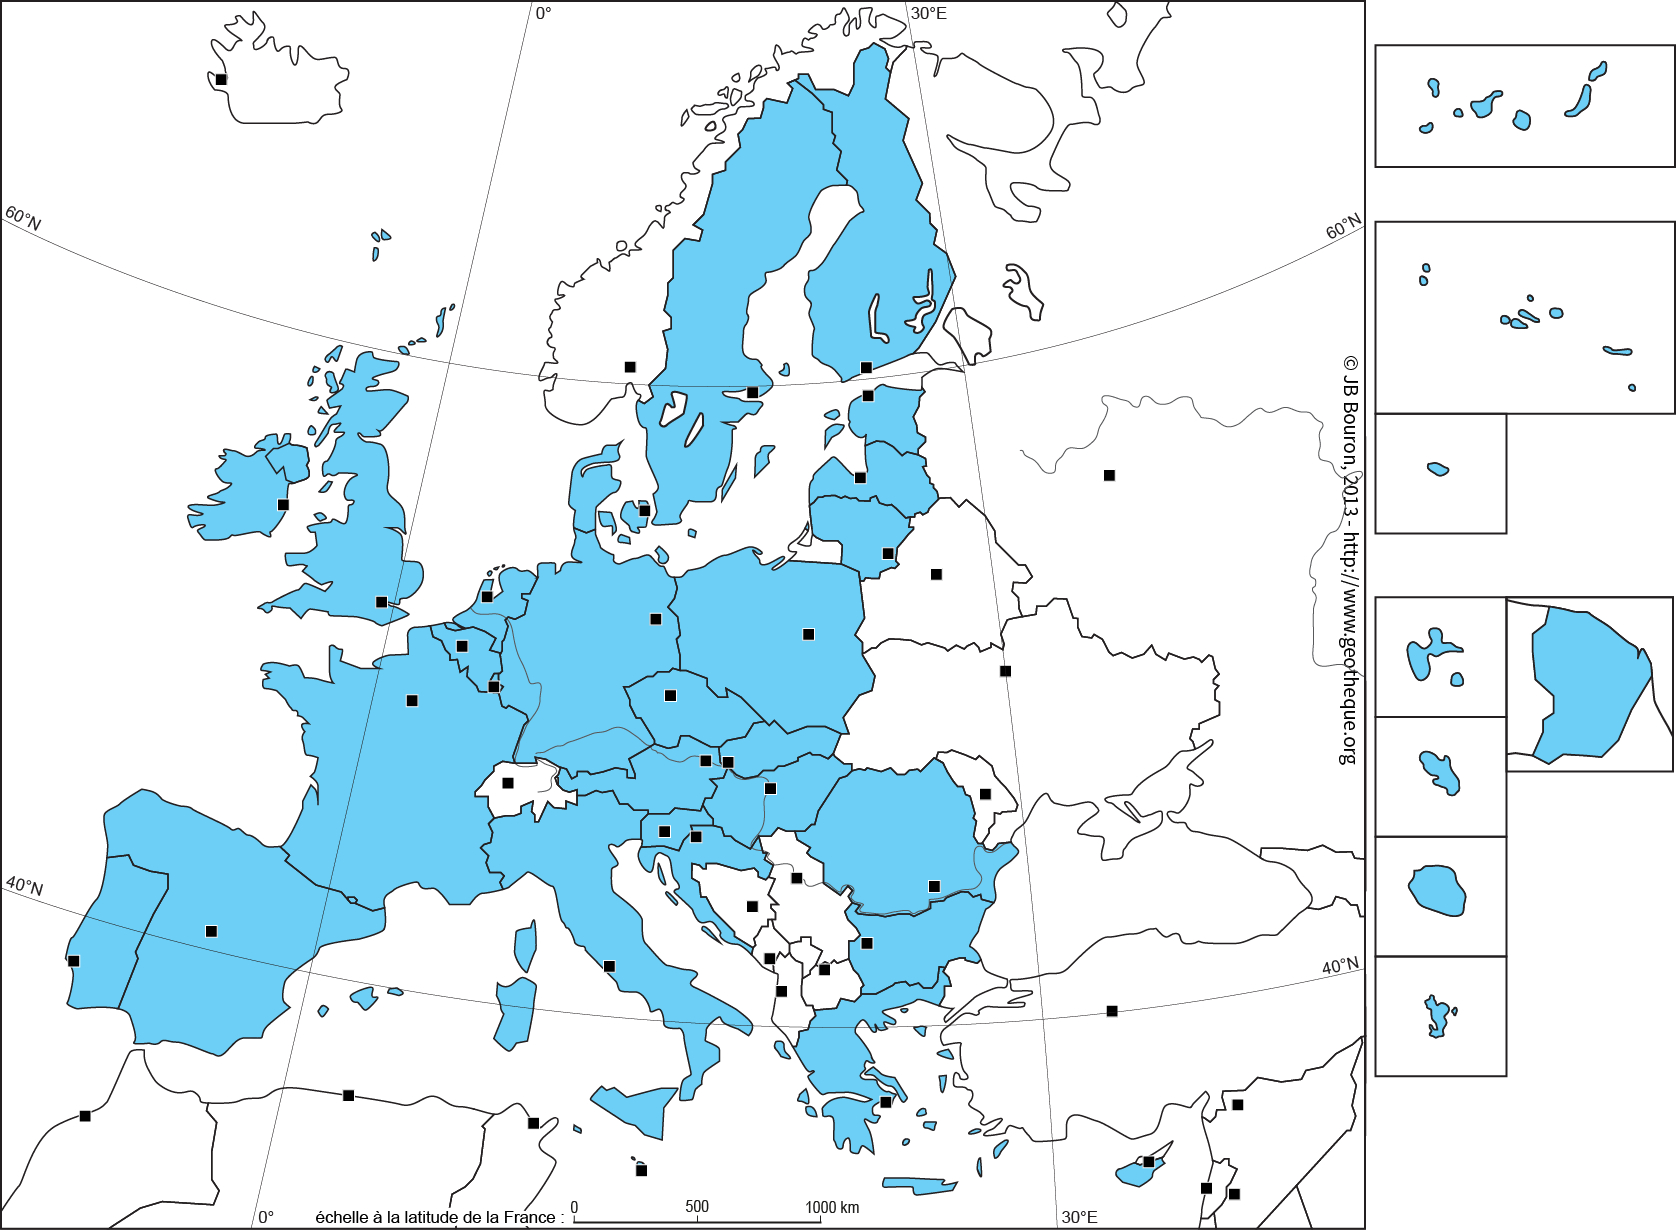 Fond De Carte De L'union Européenne À 28 - Ue28 - Eu28 Map tout La Carte De L Union Européenne